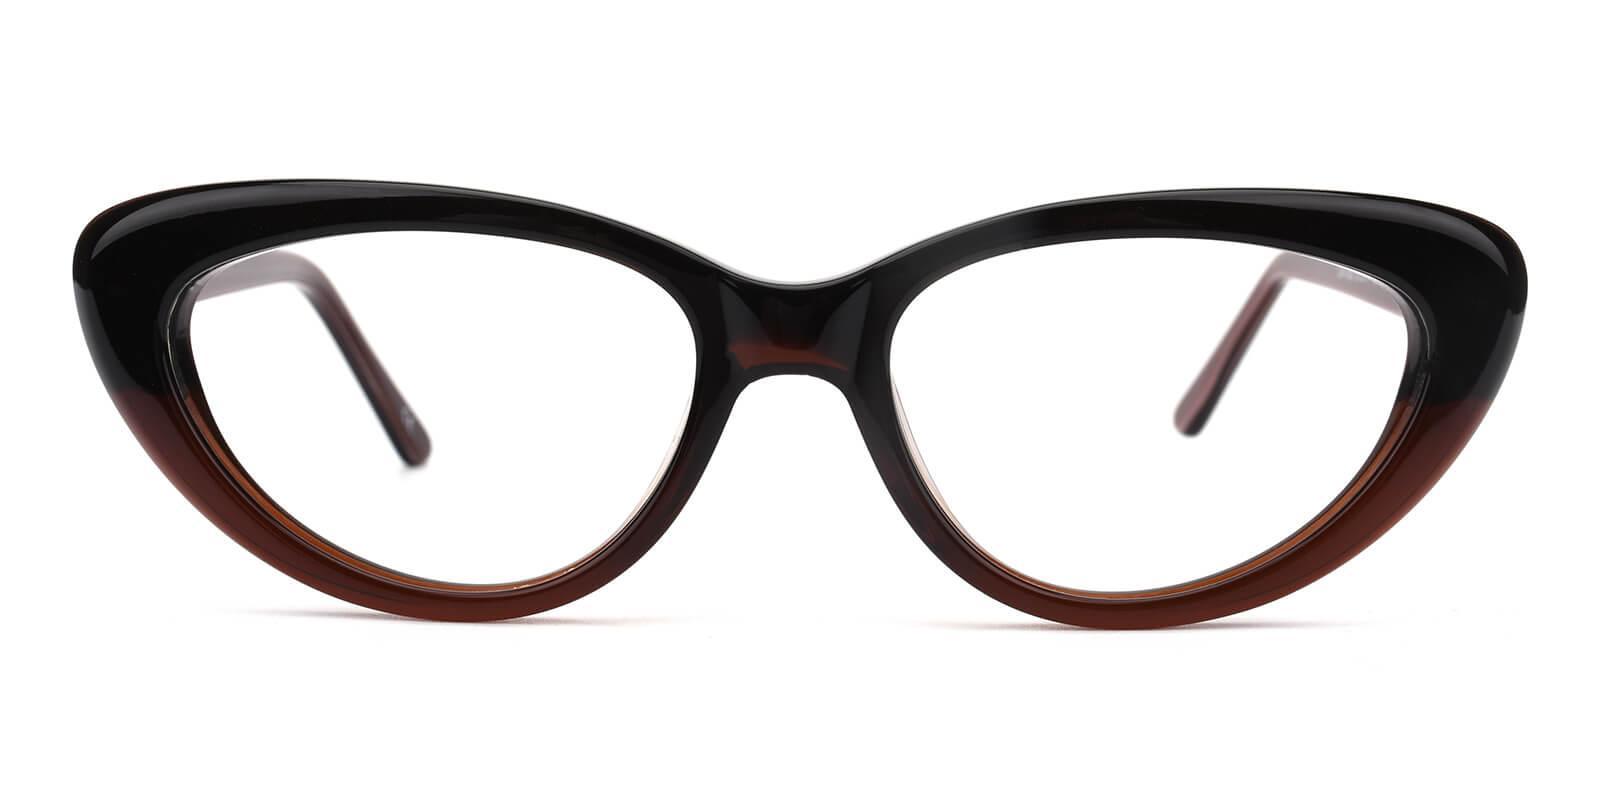 Retro-Brown-Cat-Acetate-Eyeglasses-additional2